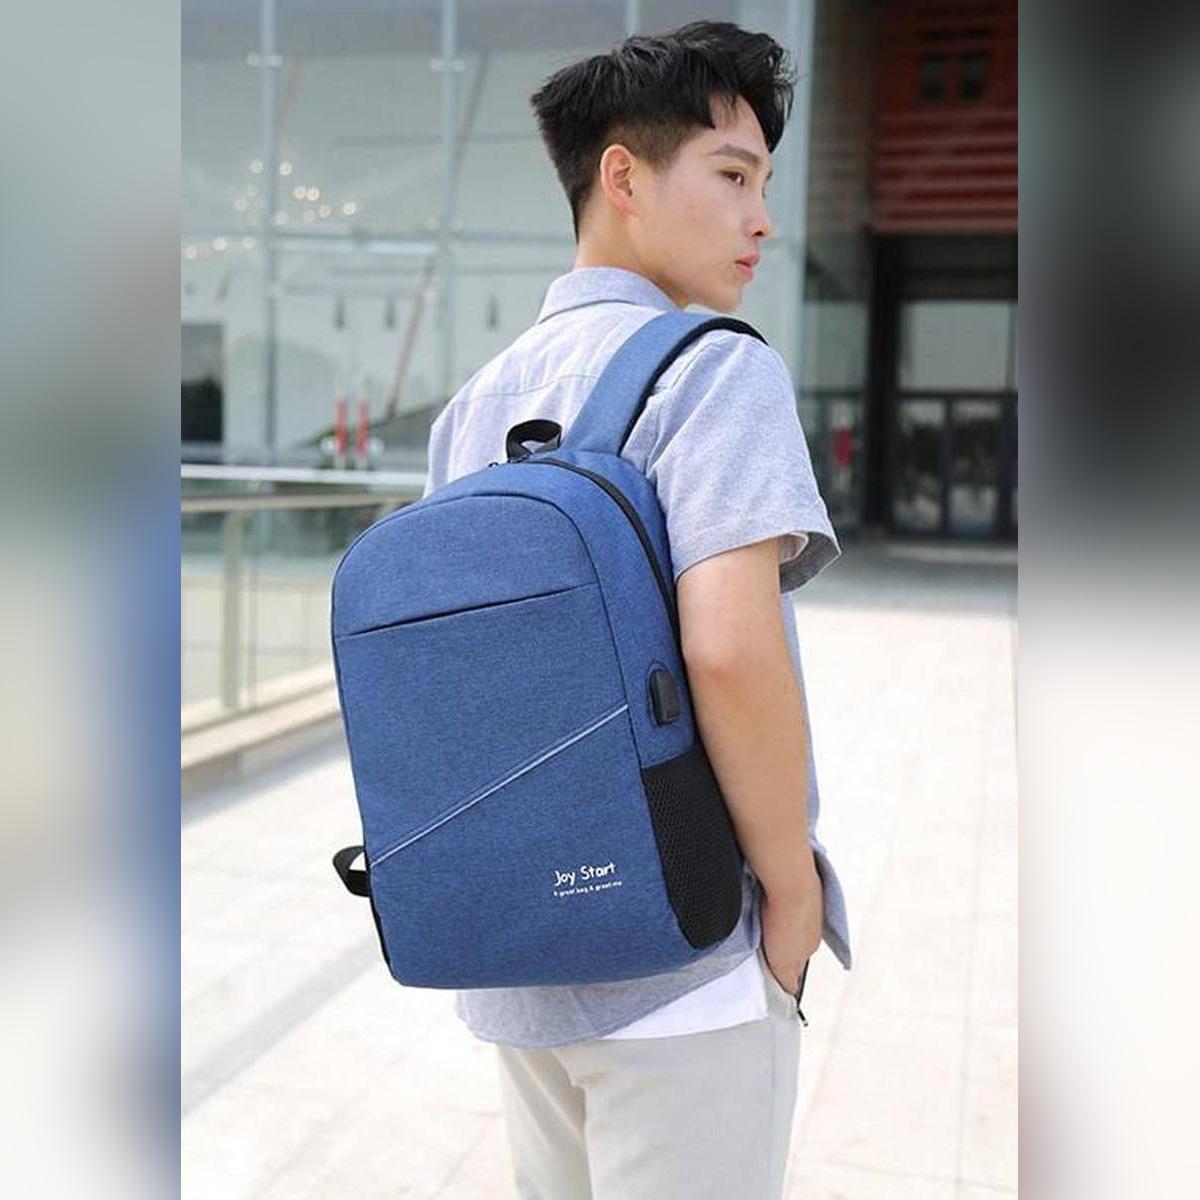 USB Charging Business Backup , Men Backup,Women Backup, Boys School Backpack , Boys Book Bags,Branded Bag,Boys College Bag,Boys University Bag,Laptop Bag,Casual Bag,Business Bag,Girls School College University Bag